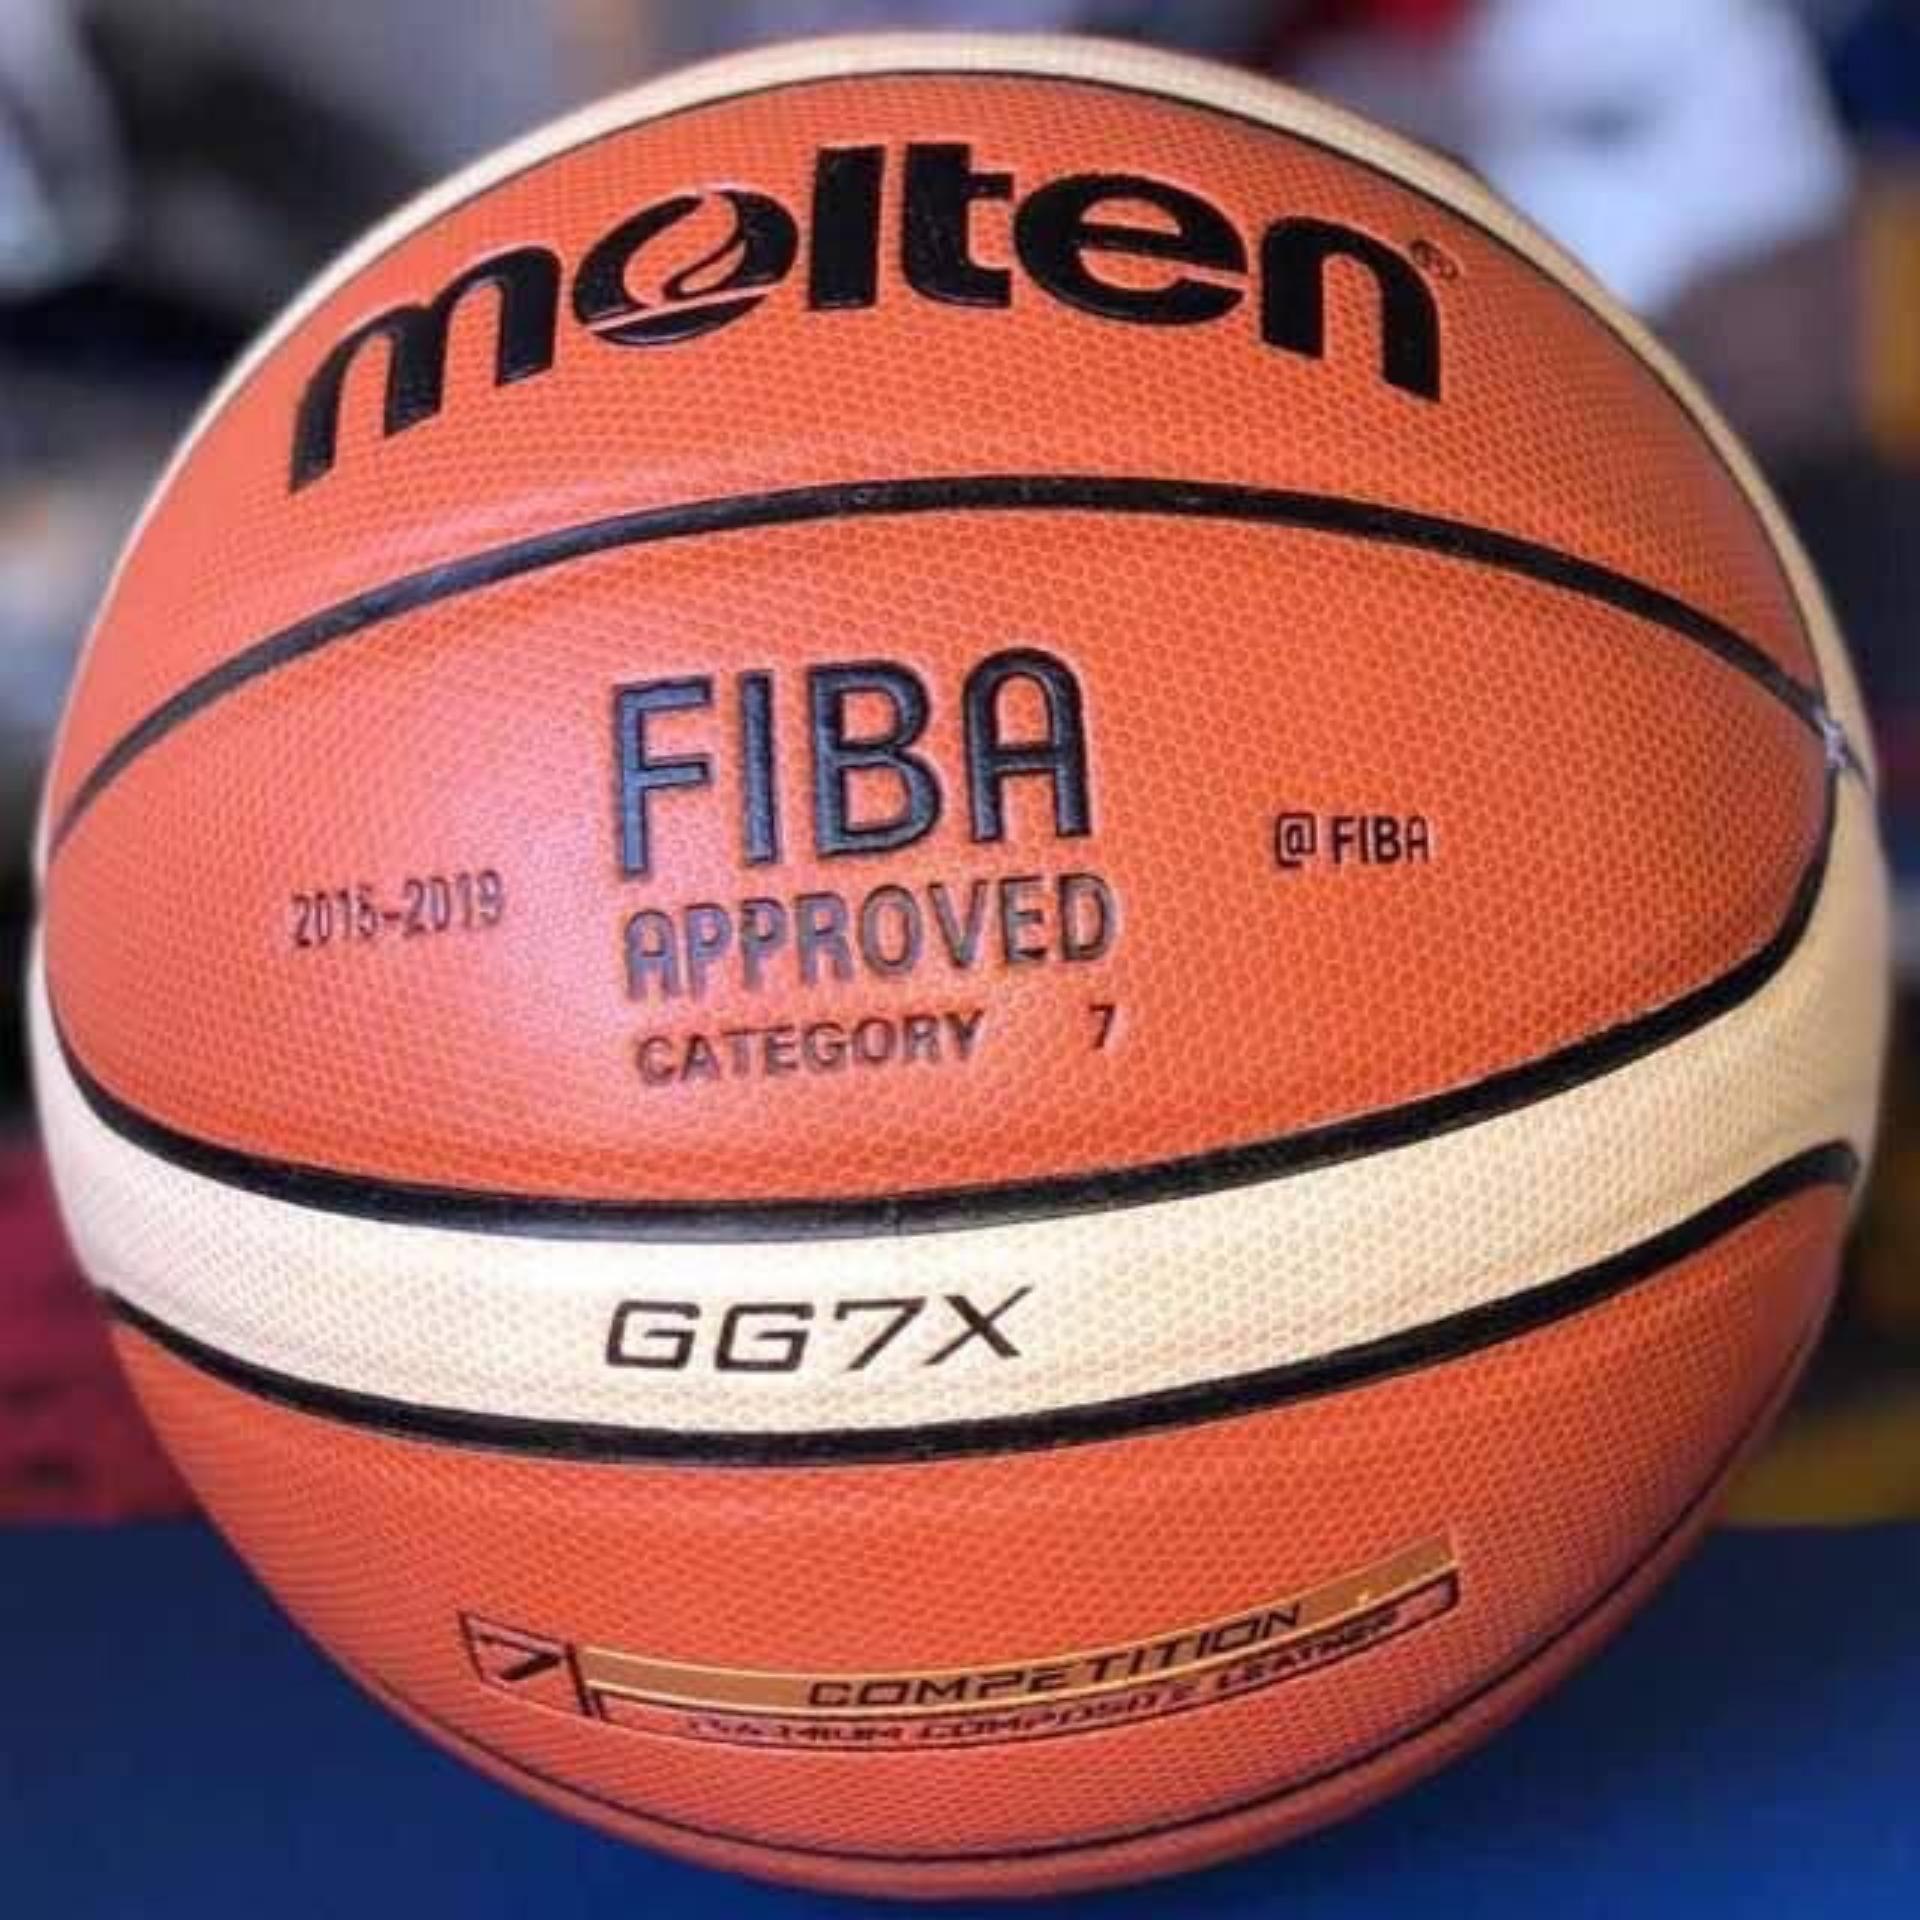 596691c76bb Team Sports for sale - Team Sports Equipment online brands